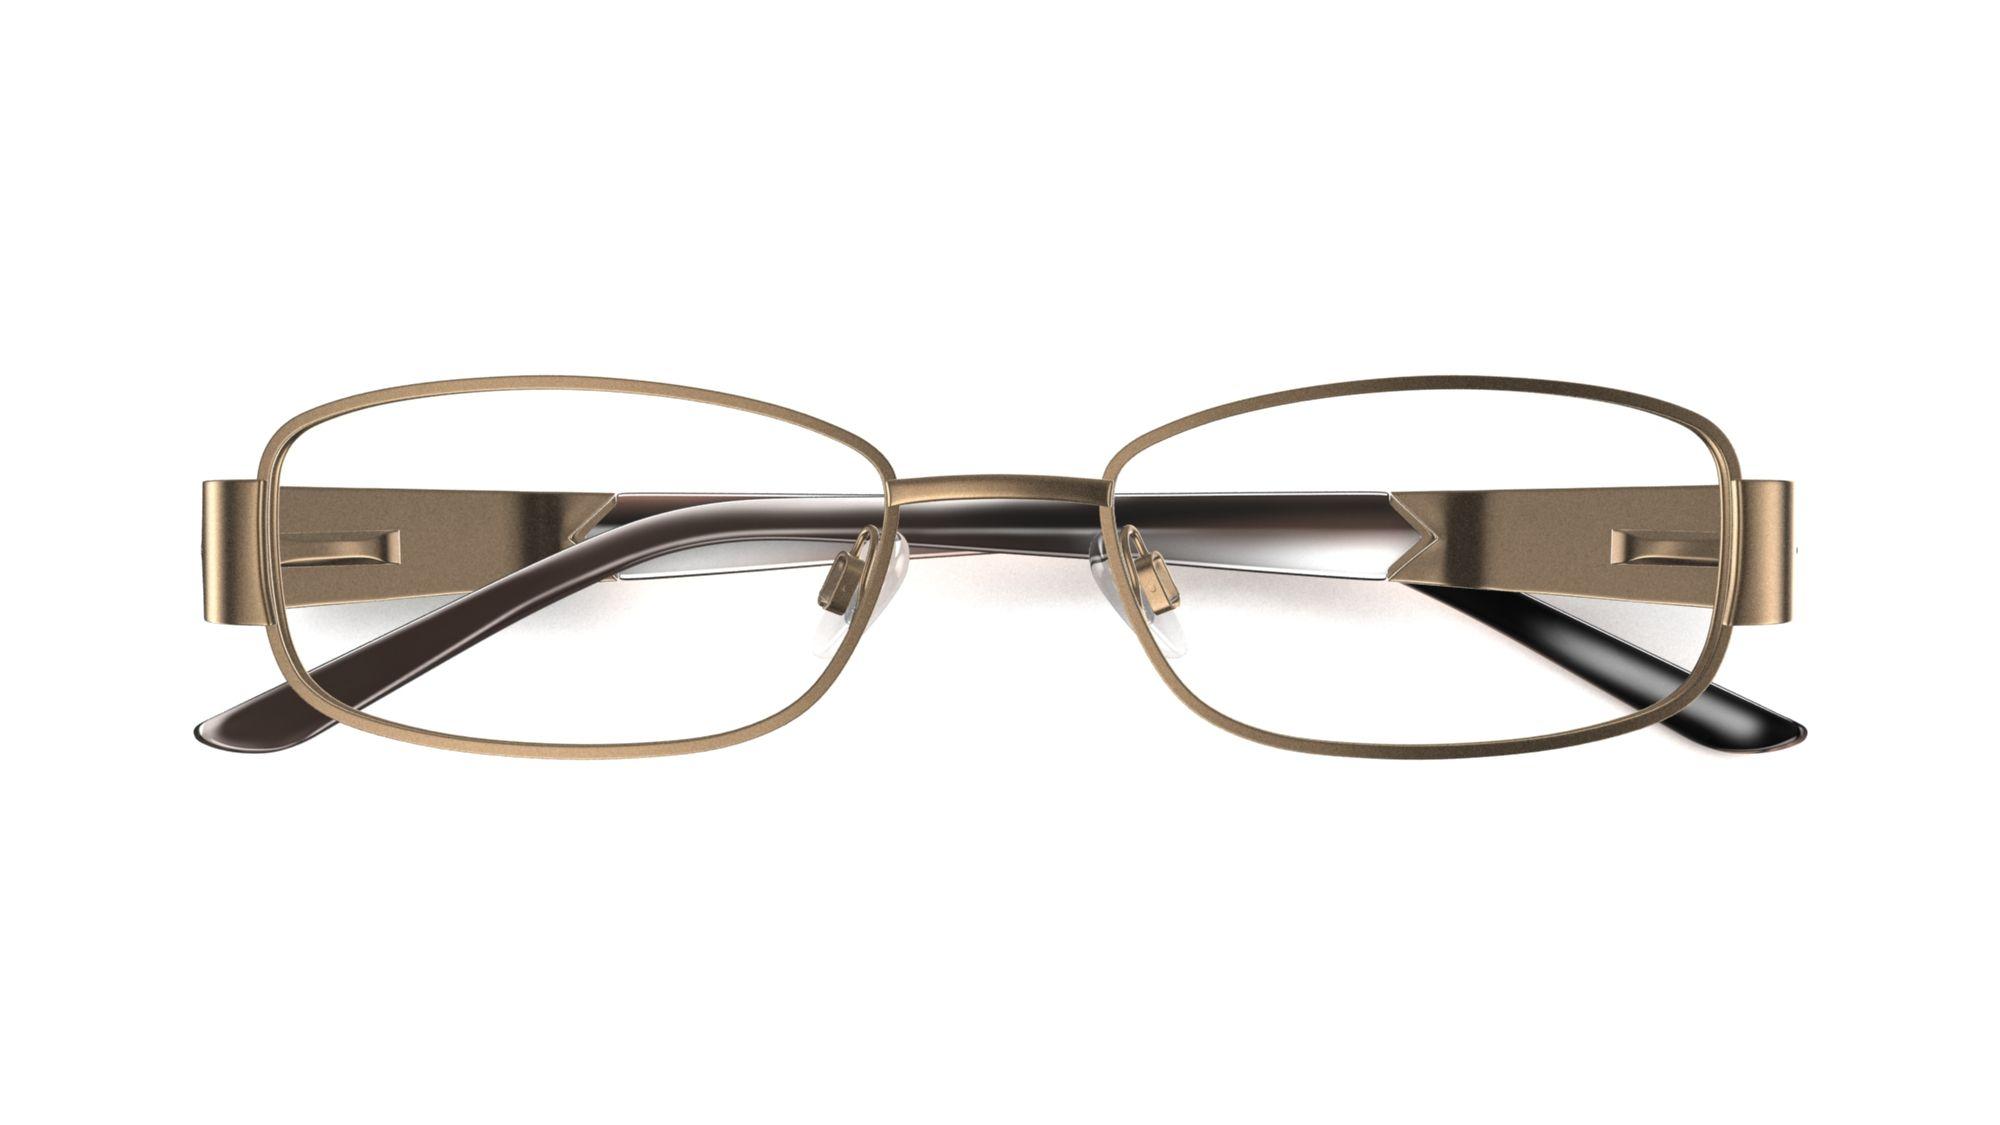 Specsavers glasses PHEBE Glasses, Womens glasses